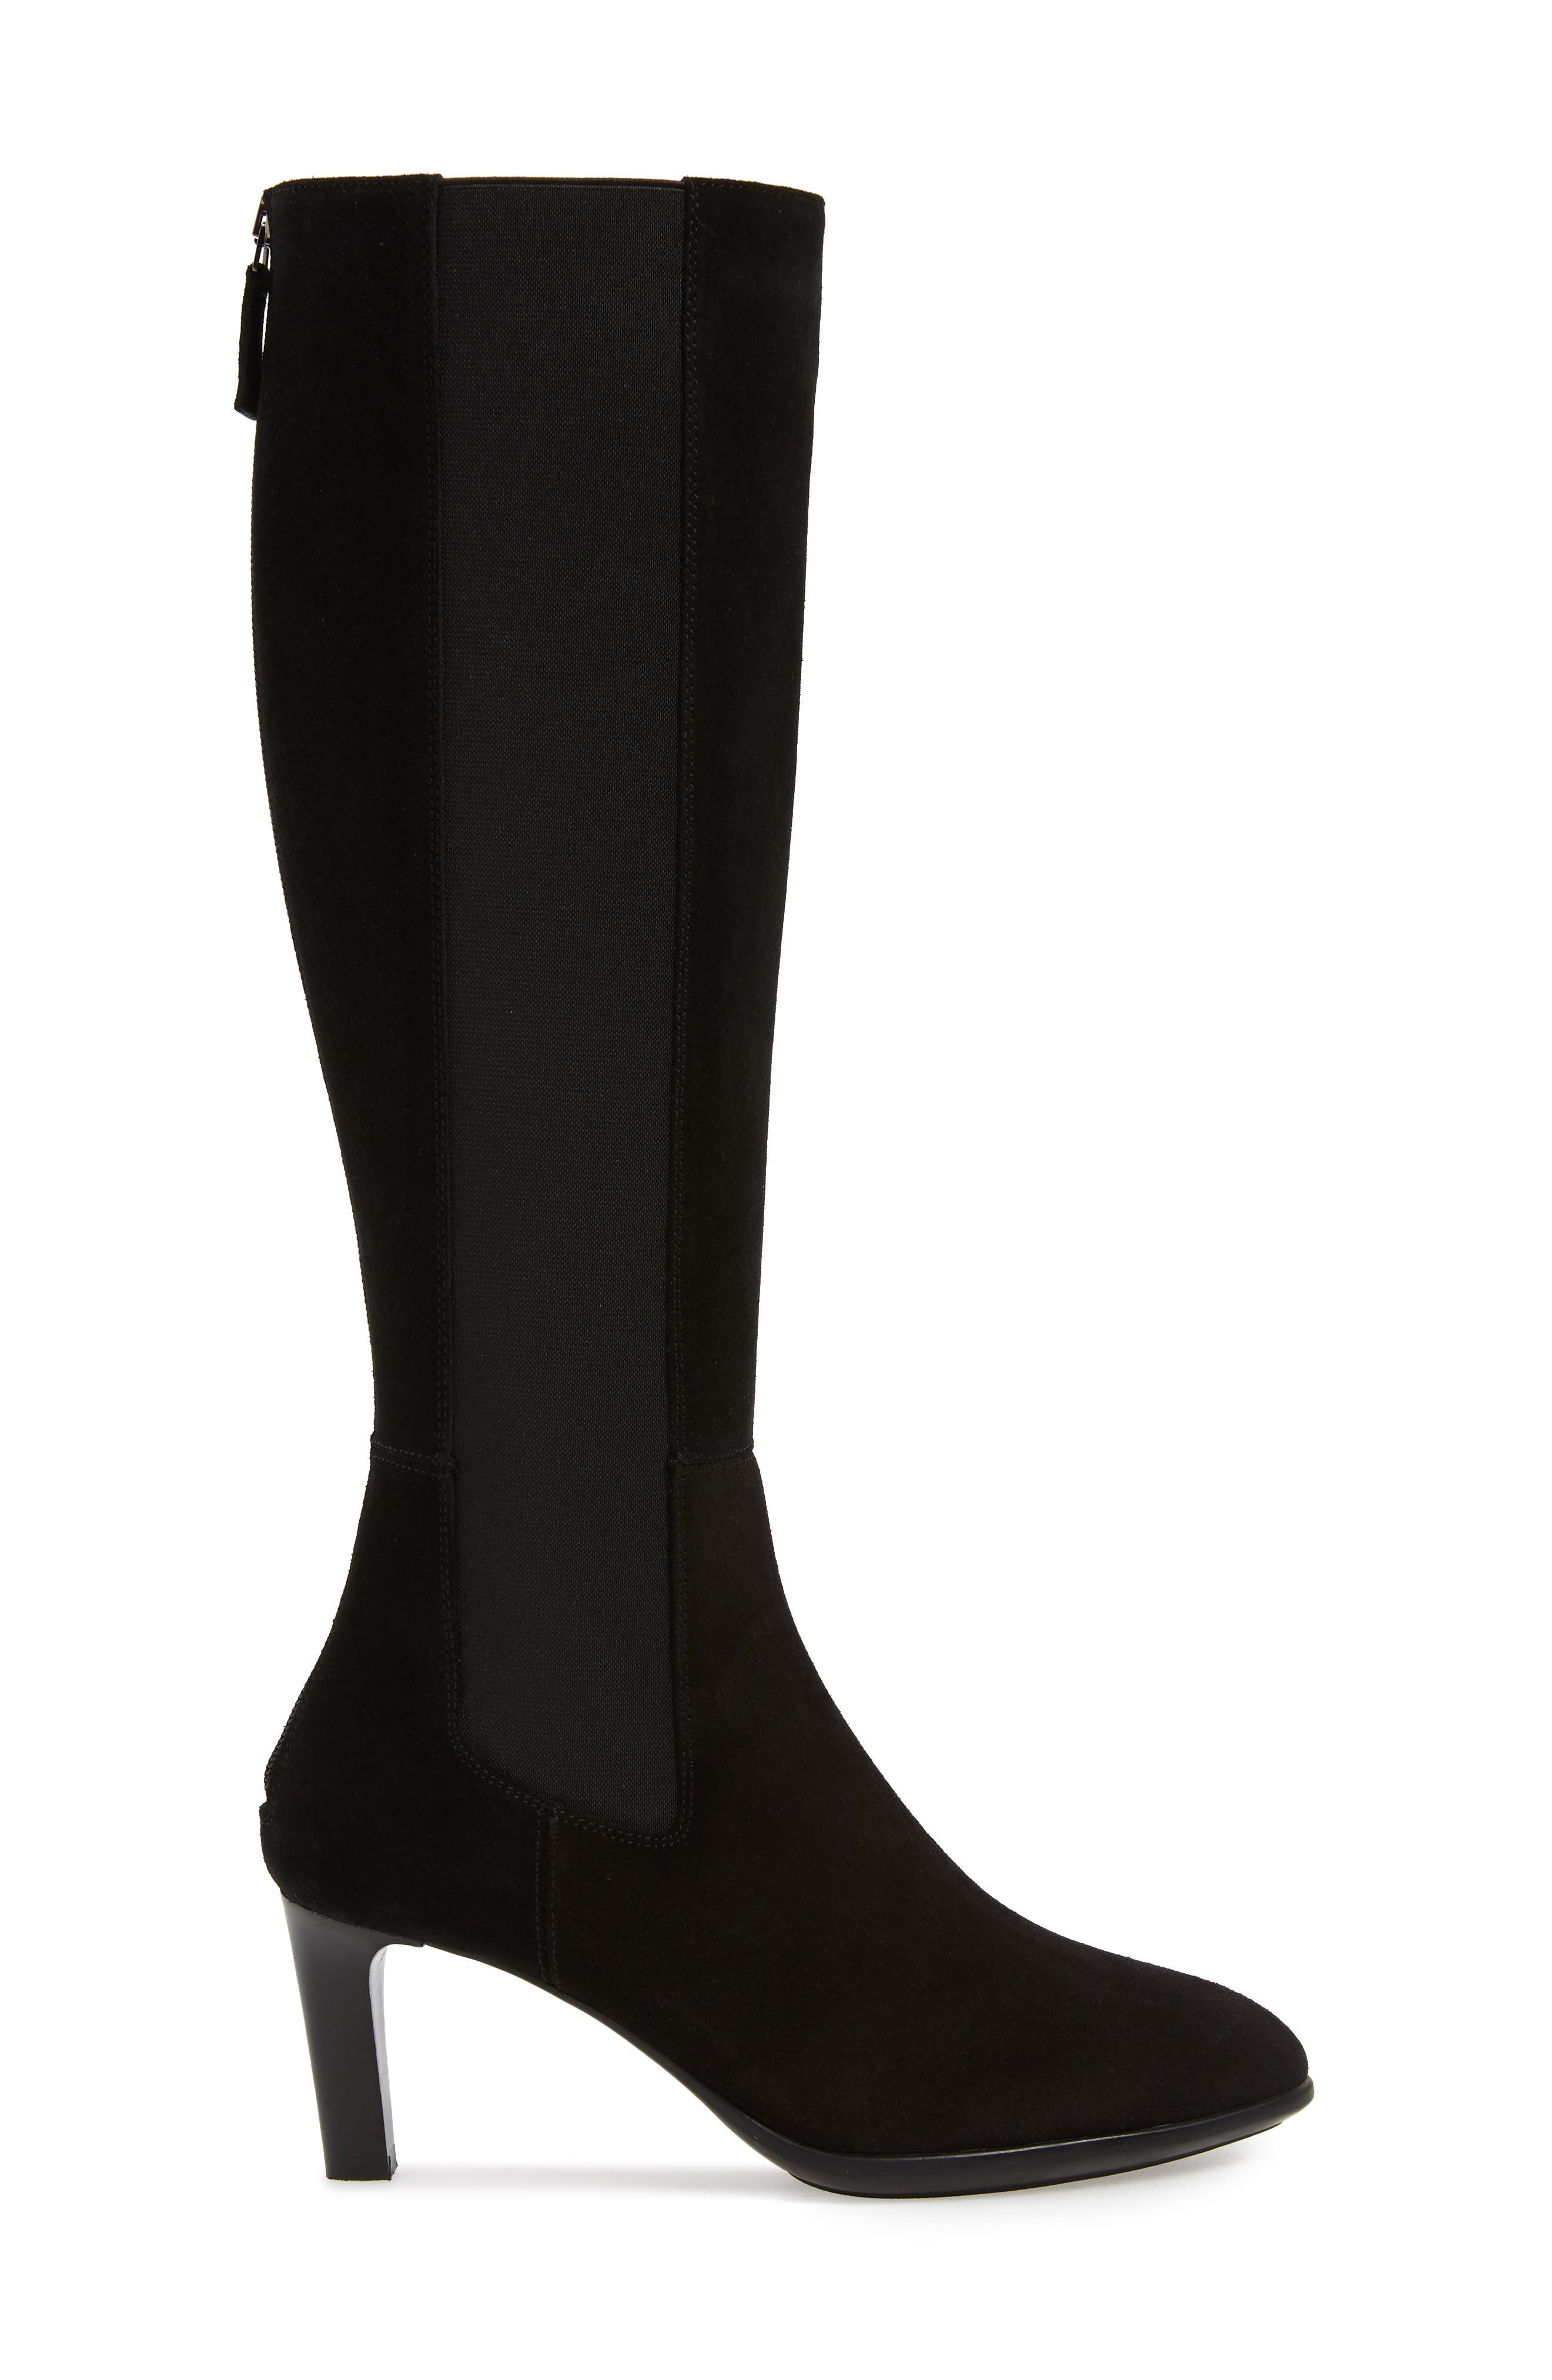 AQUATALIA, Dahliana Weatherproof Knee High Boot, Alternate thumbnail 3, color, BLACK